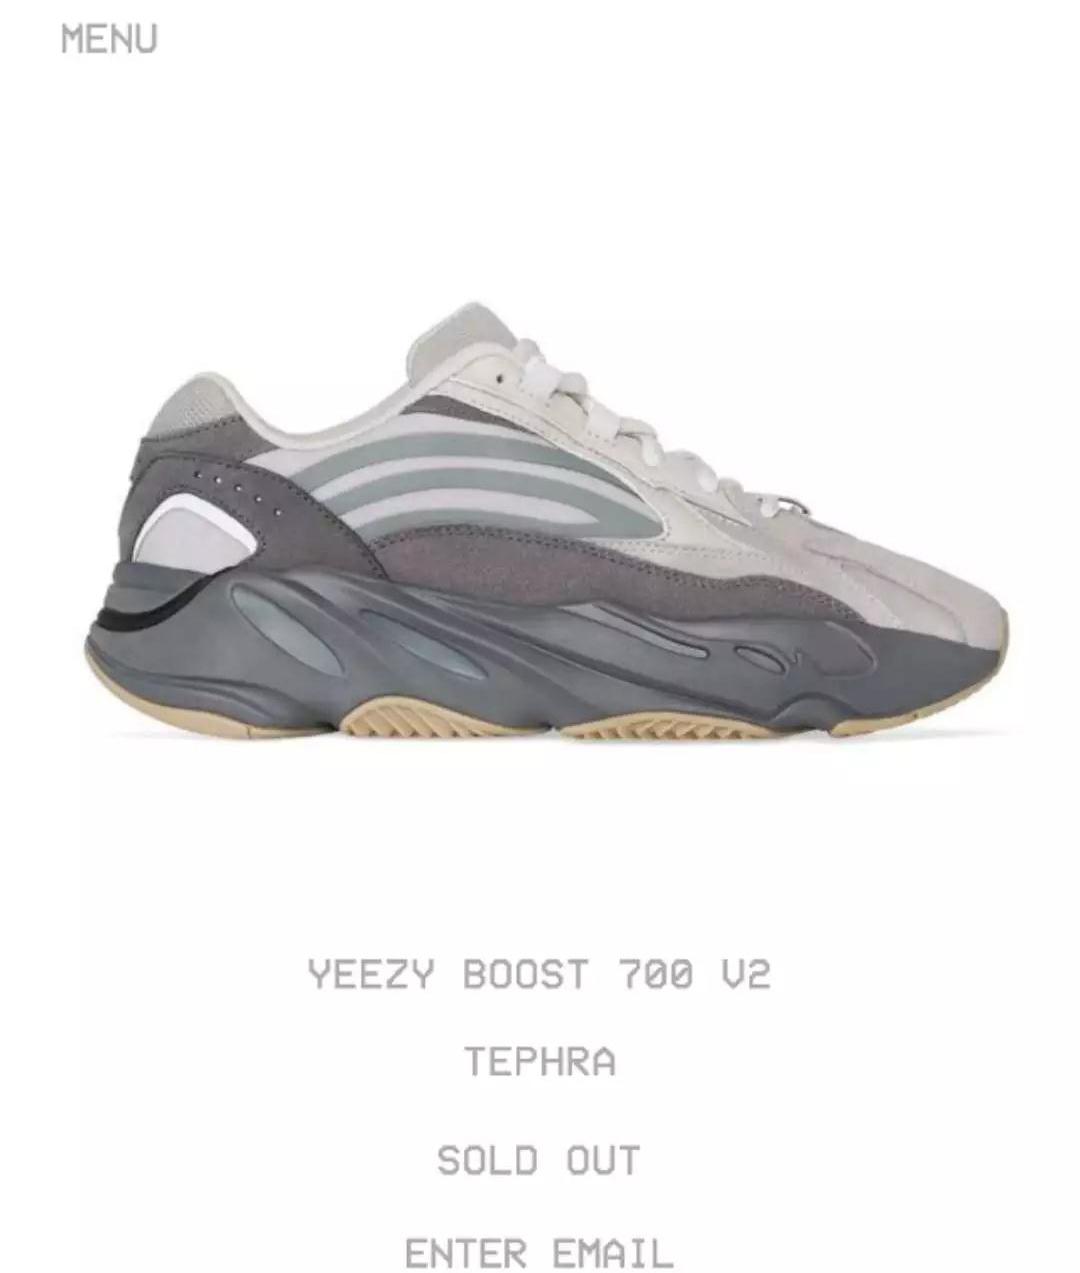 adidas,Yeezy 700 V2,发售,FU7914  上架 7 分钟全码售罄!「火山灰」Yeezy 700 V2 会是黑马么?